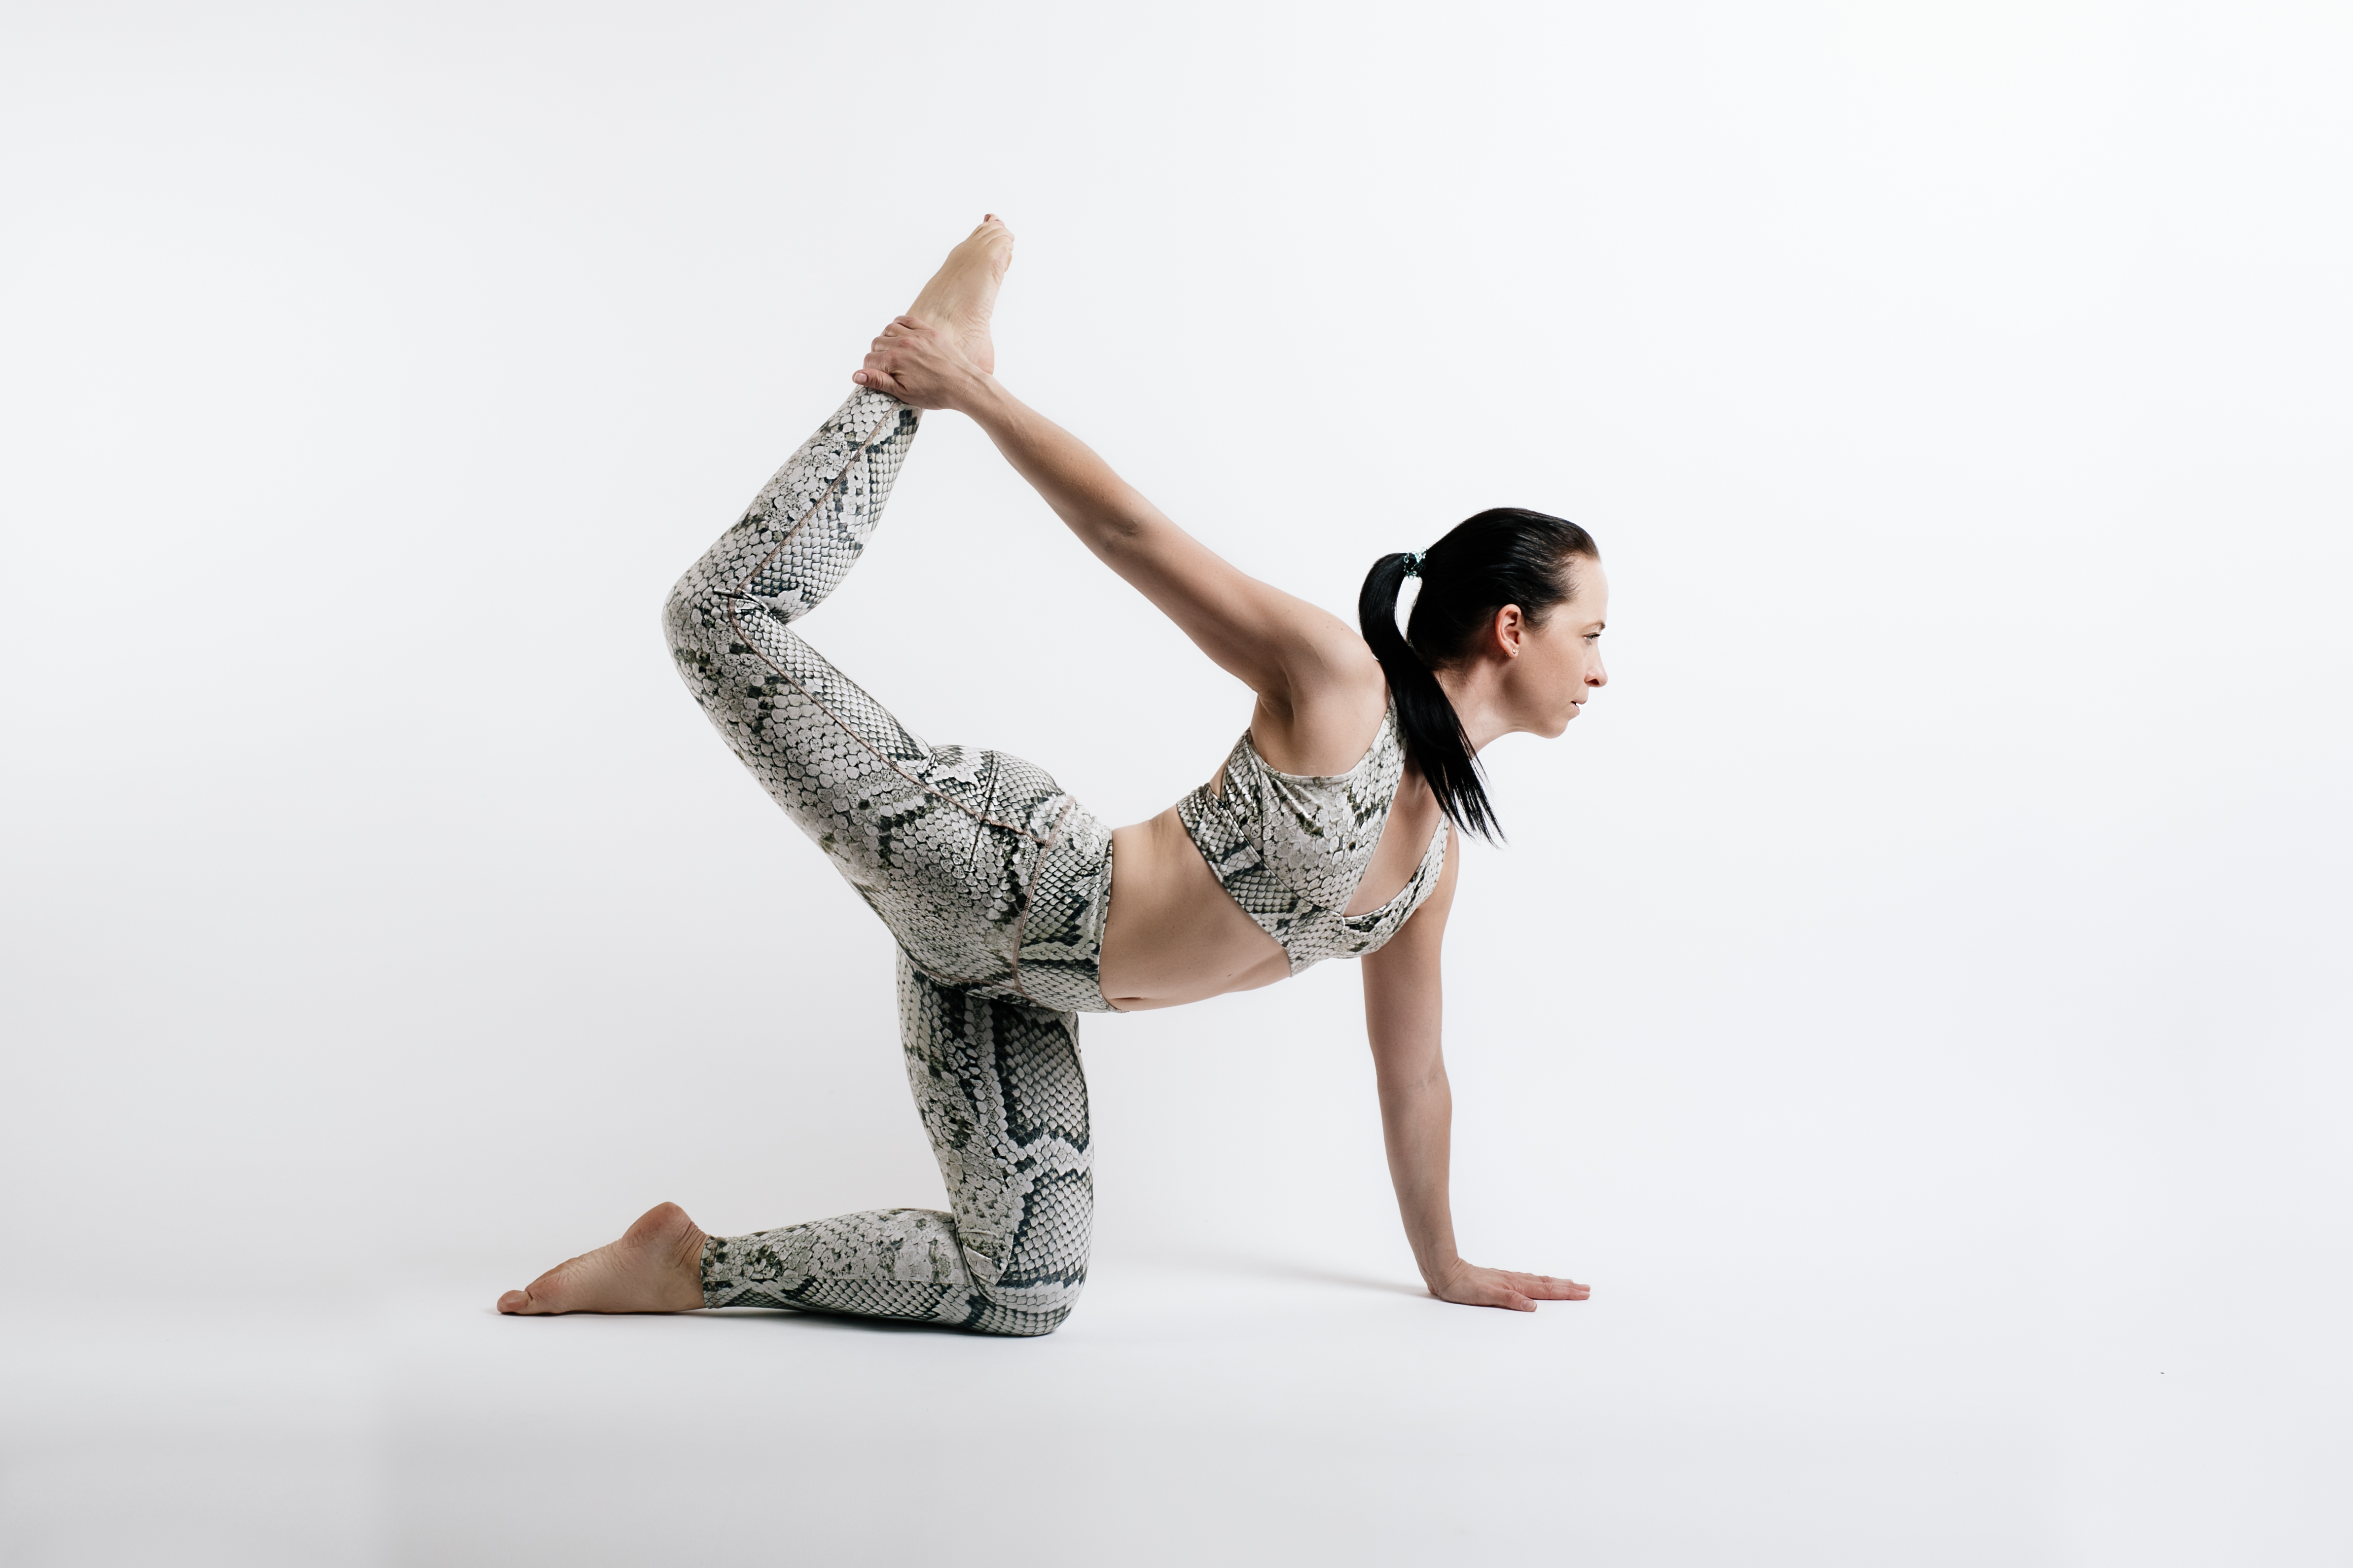 Slings Myofasziale Training - Recovery Workout